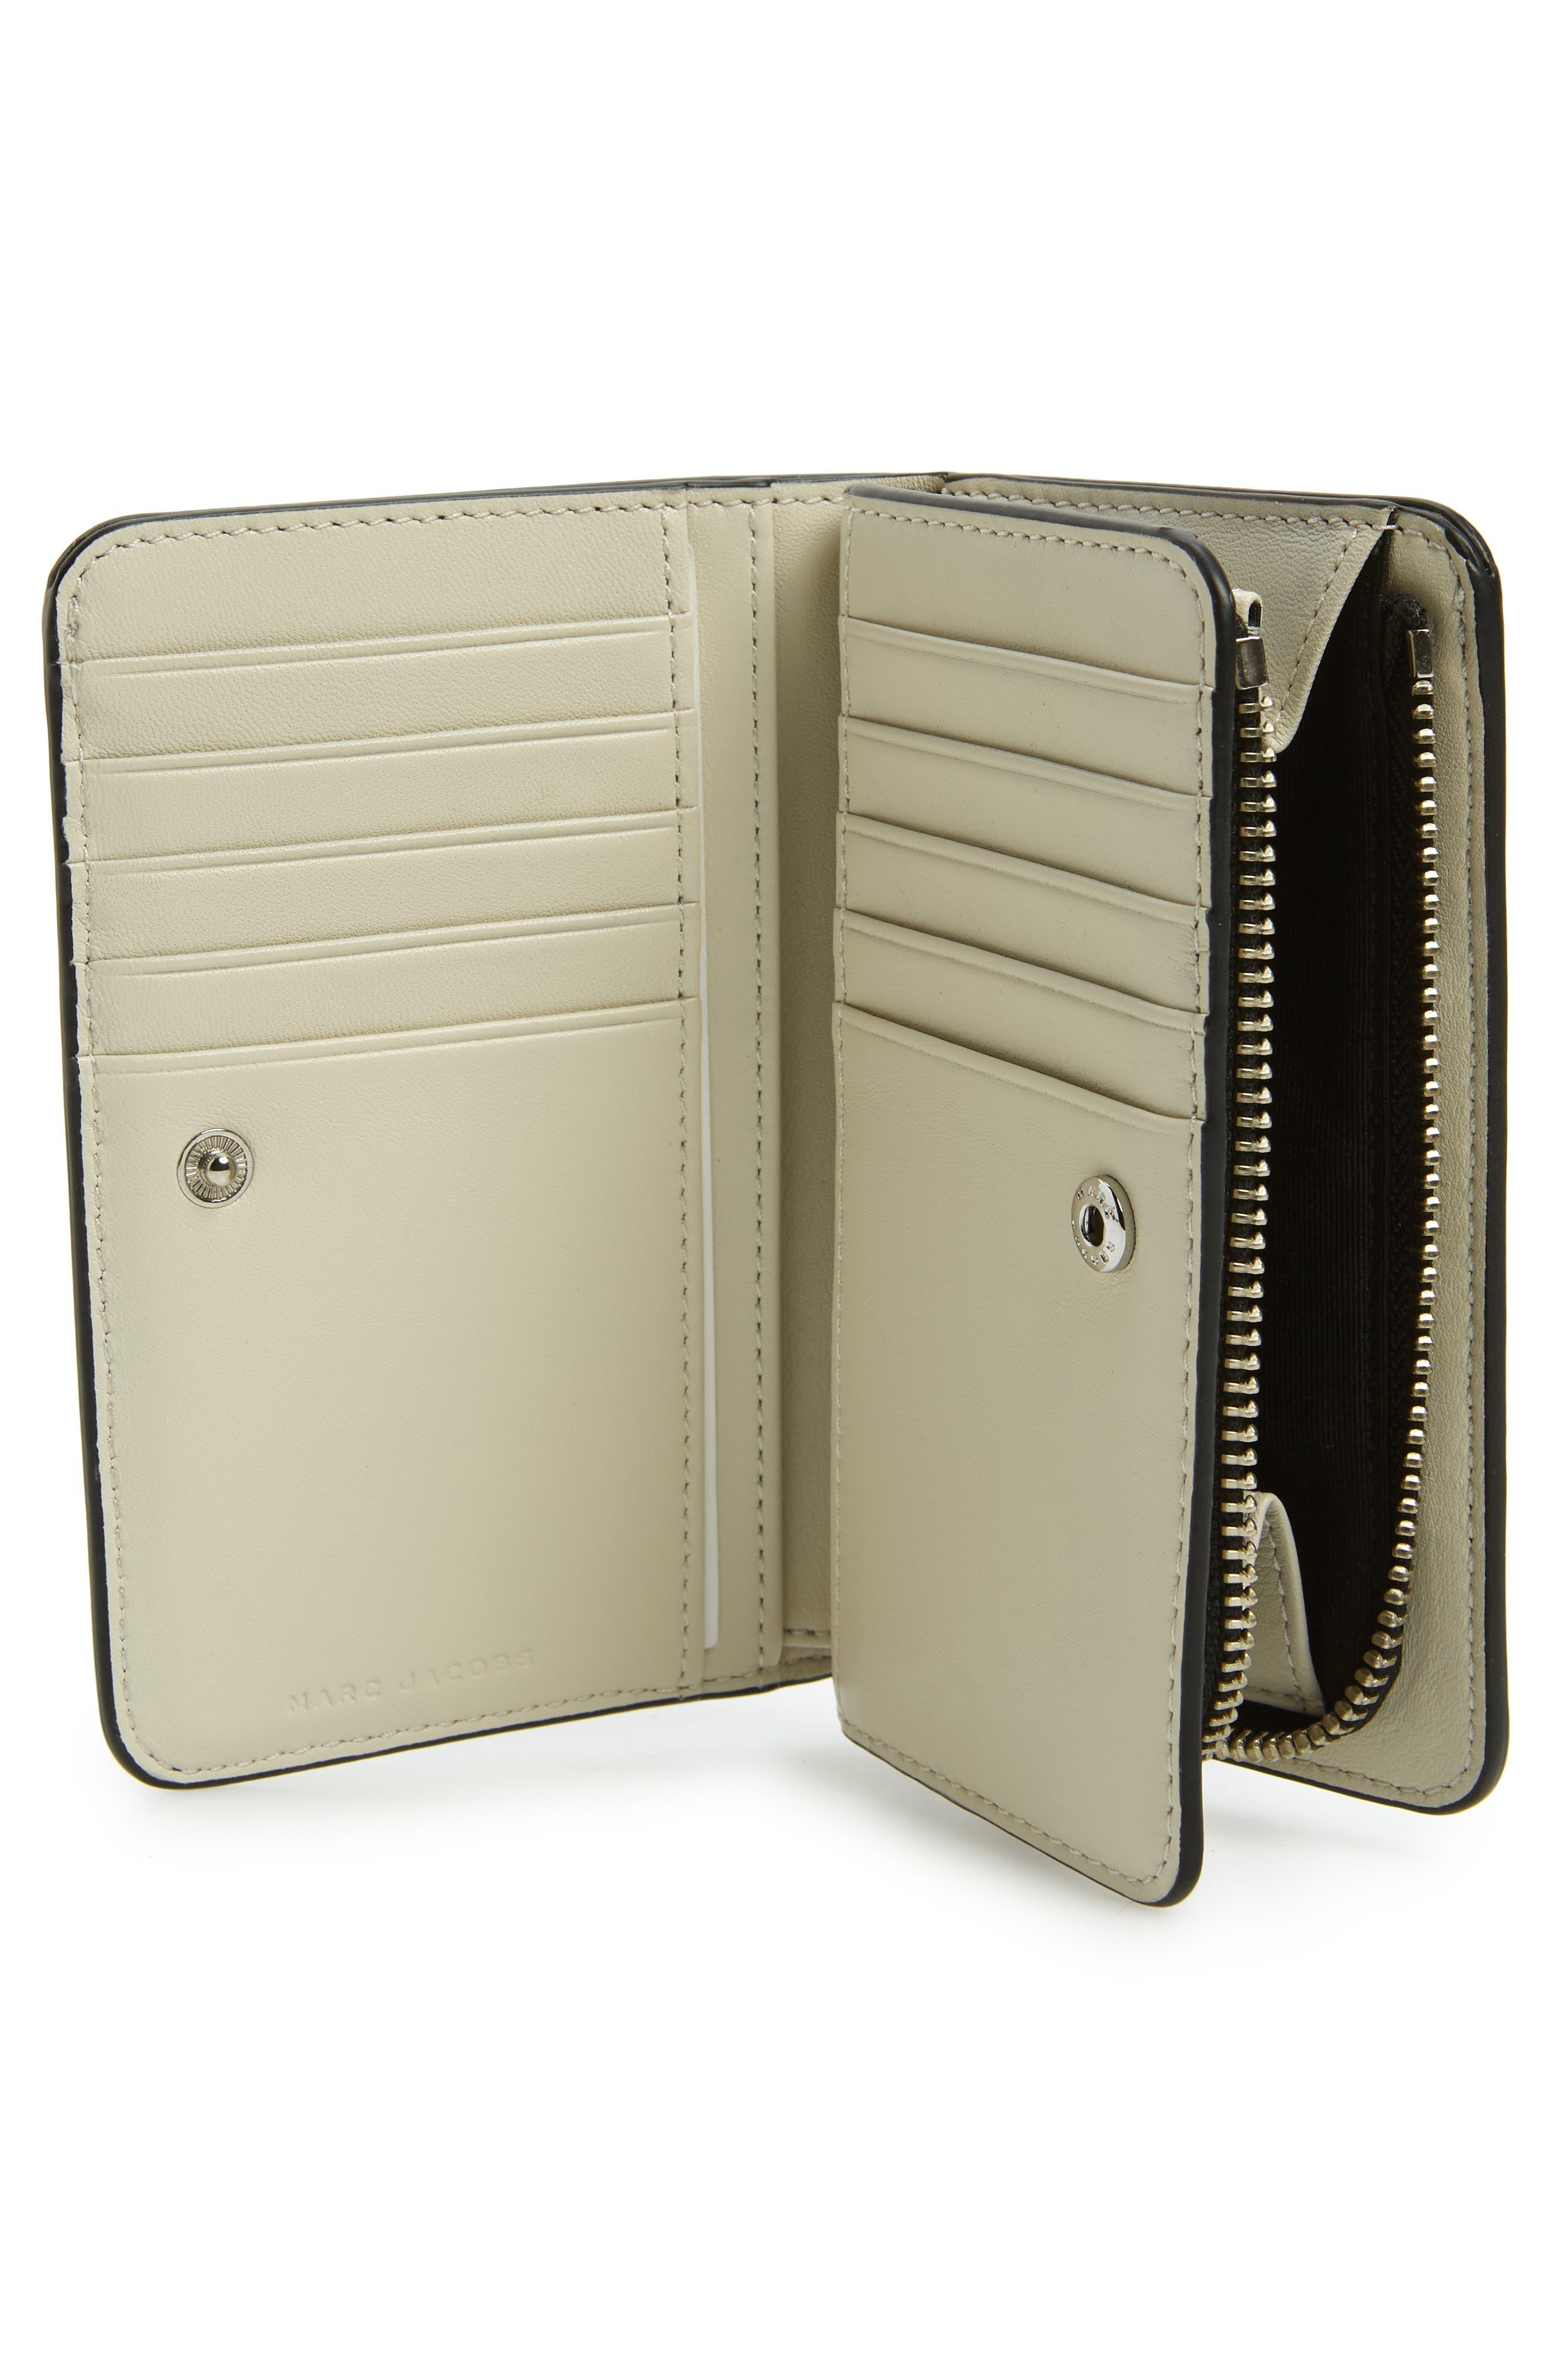 Sport Compact Leather Wallet,                             Alternate thumbnail 2, color,                             BLACK/ WHITE